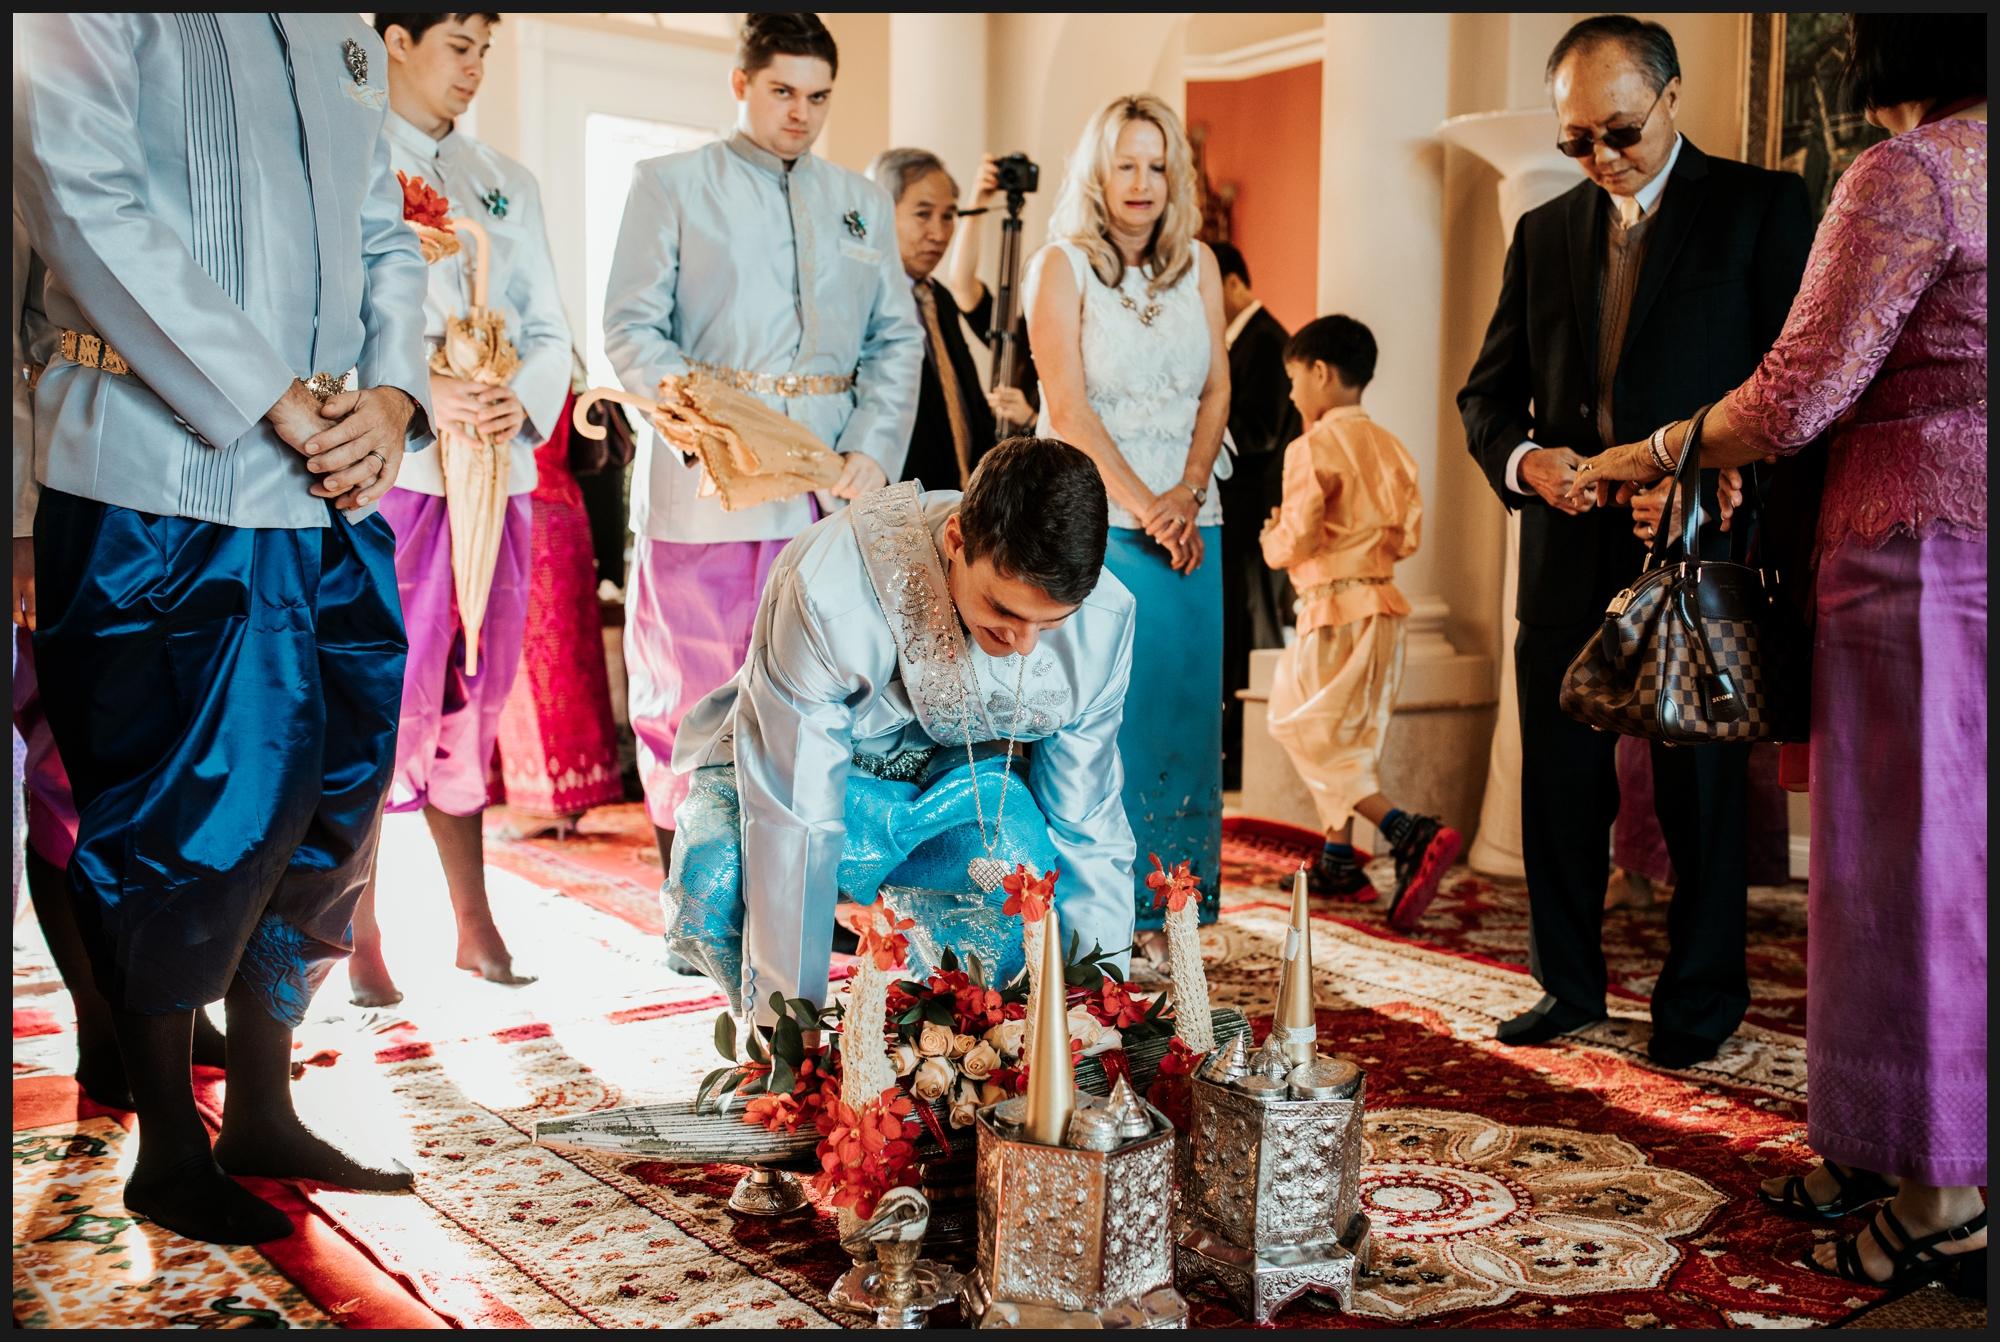 Orlando-Wedding-Photographer-destination-wedding-photographer-florida-wedding-photographer-bohemian-wedding-photographer_1367.jpg